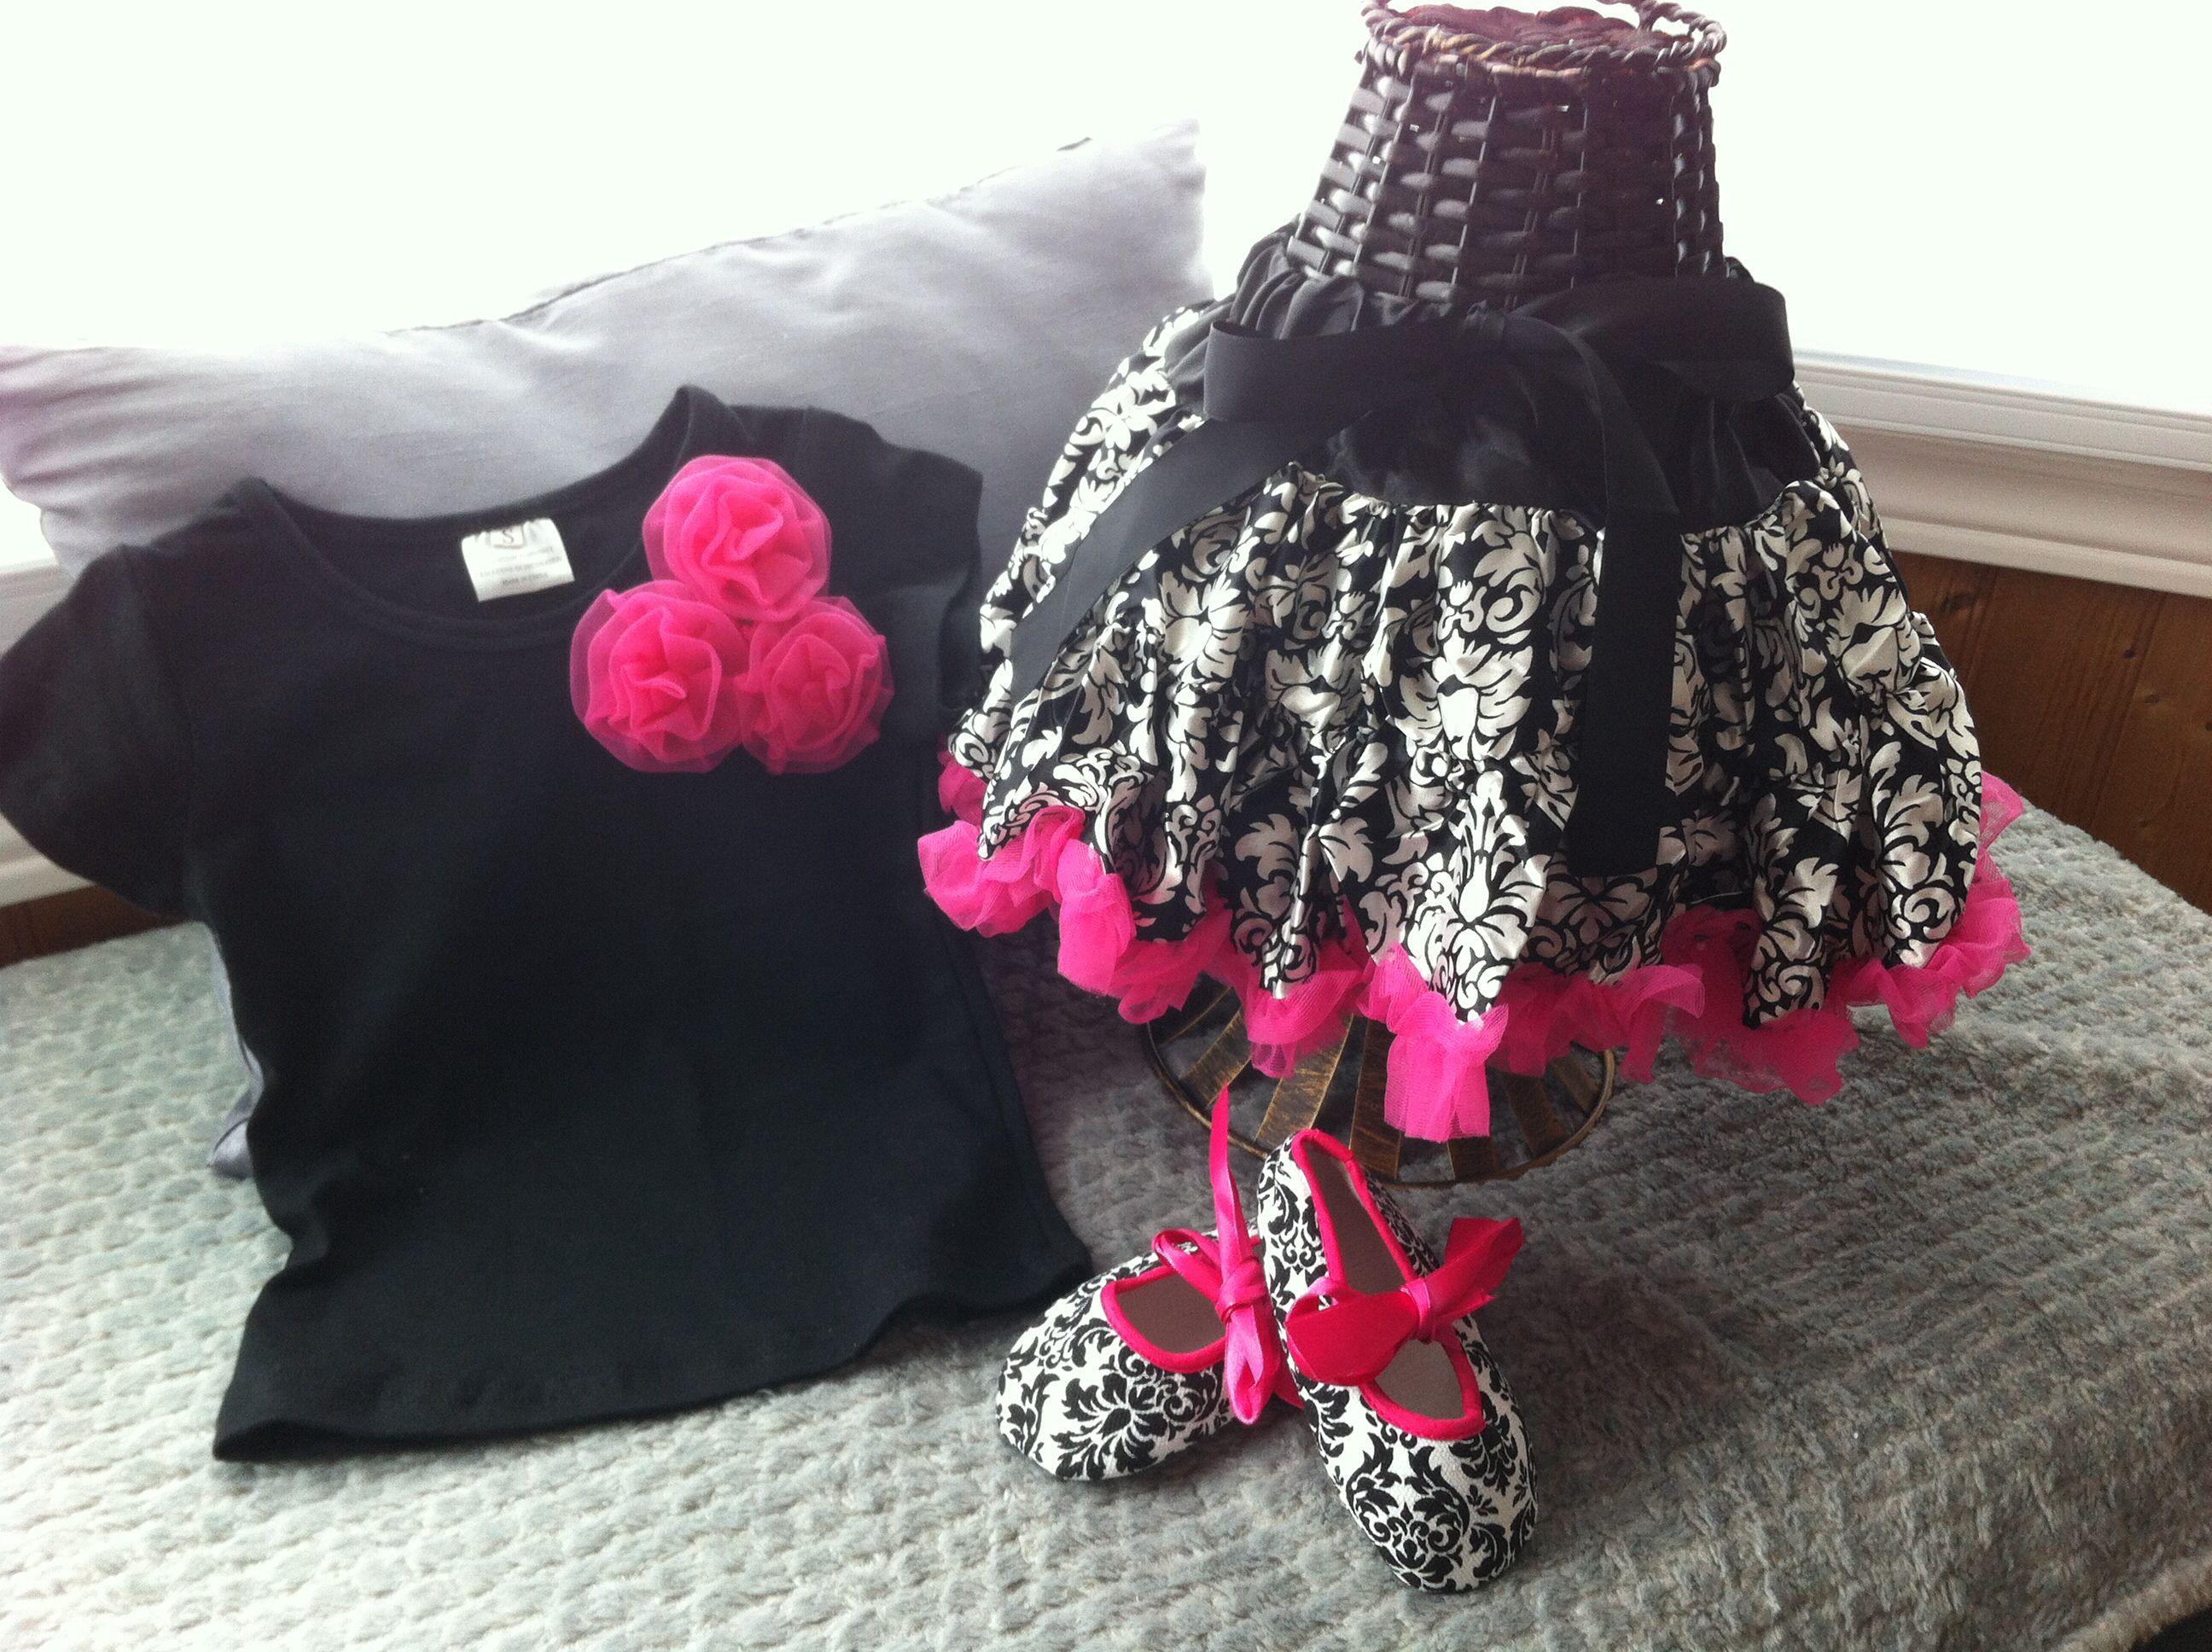 Damask Set. Gorgeous damask print set includes petti skirt, shirt & ballerina shoes. Visit my page at www.facebook.com/aprilshowersboutique6